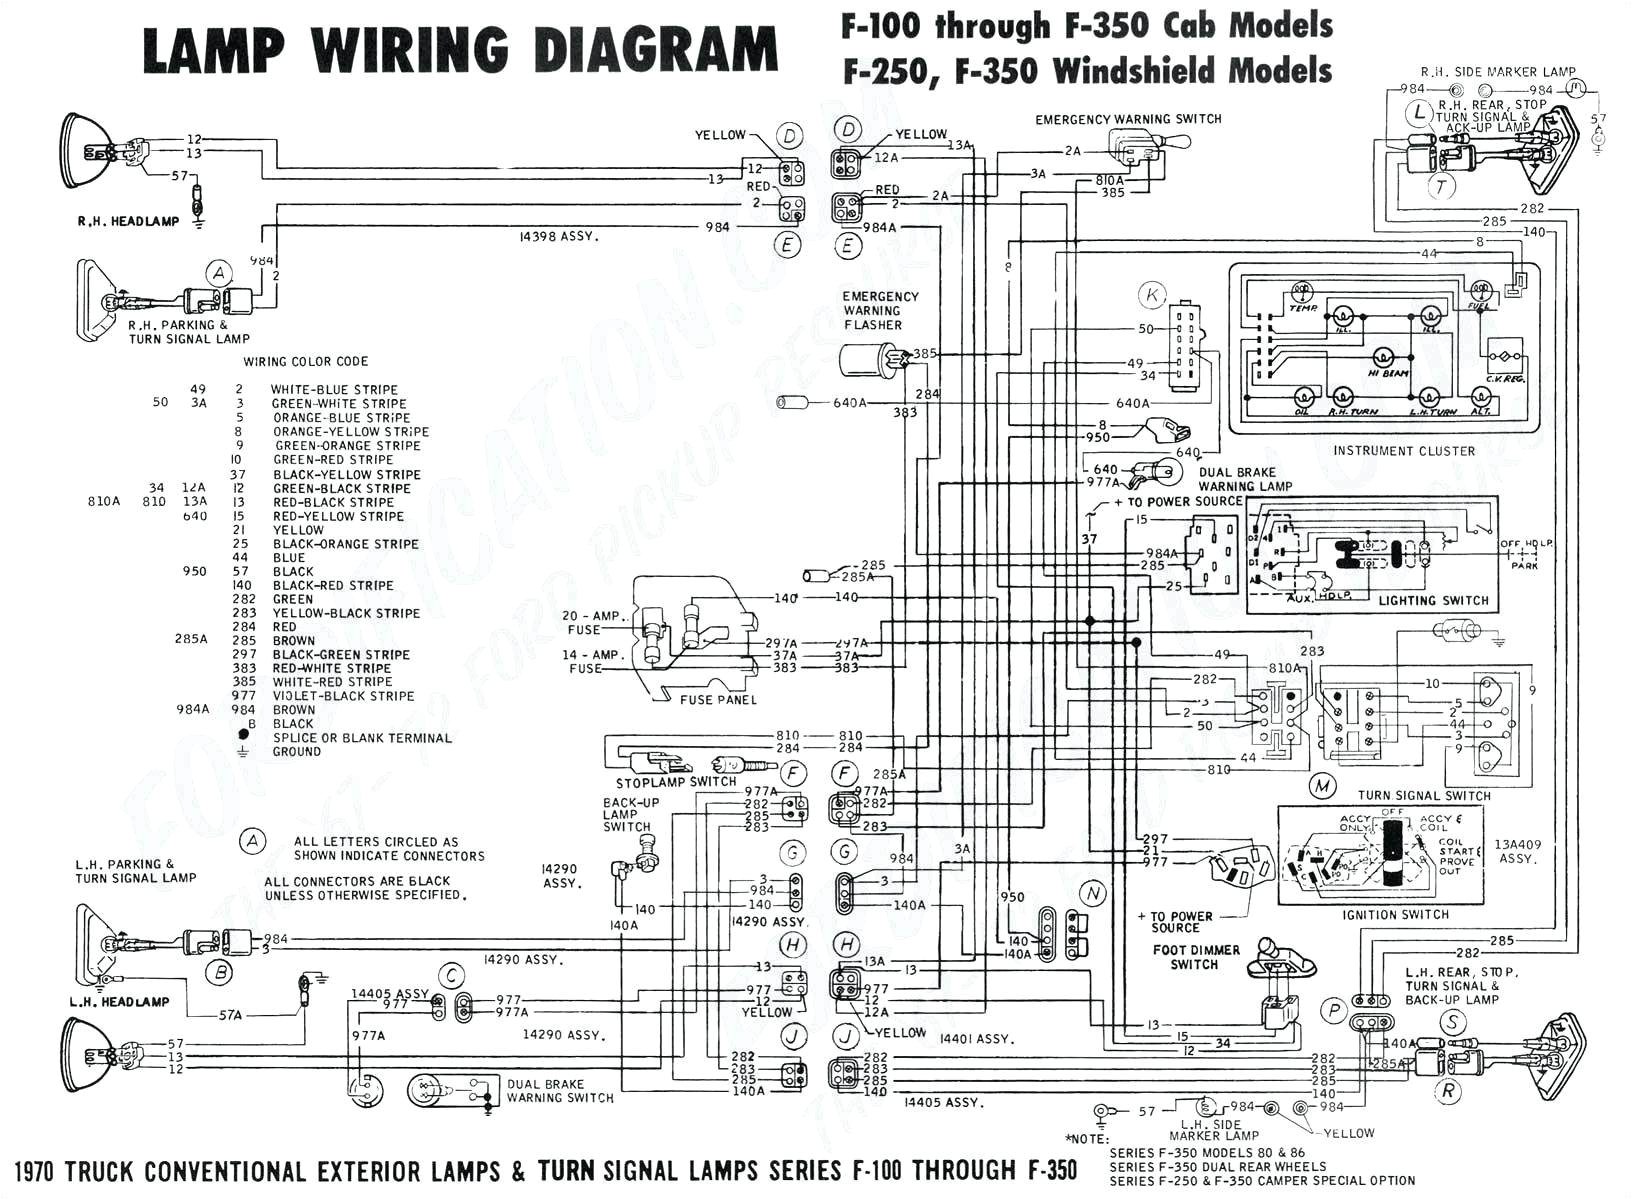 reverse light wiring diagram fresh trailer wiring diagram running lights refrence astra h reverse light